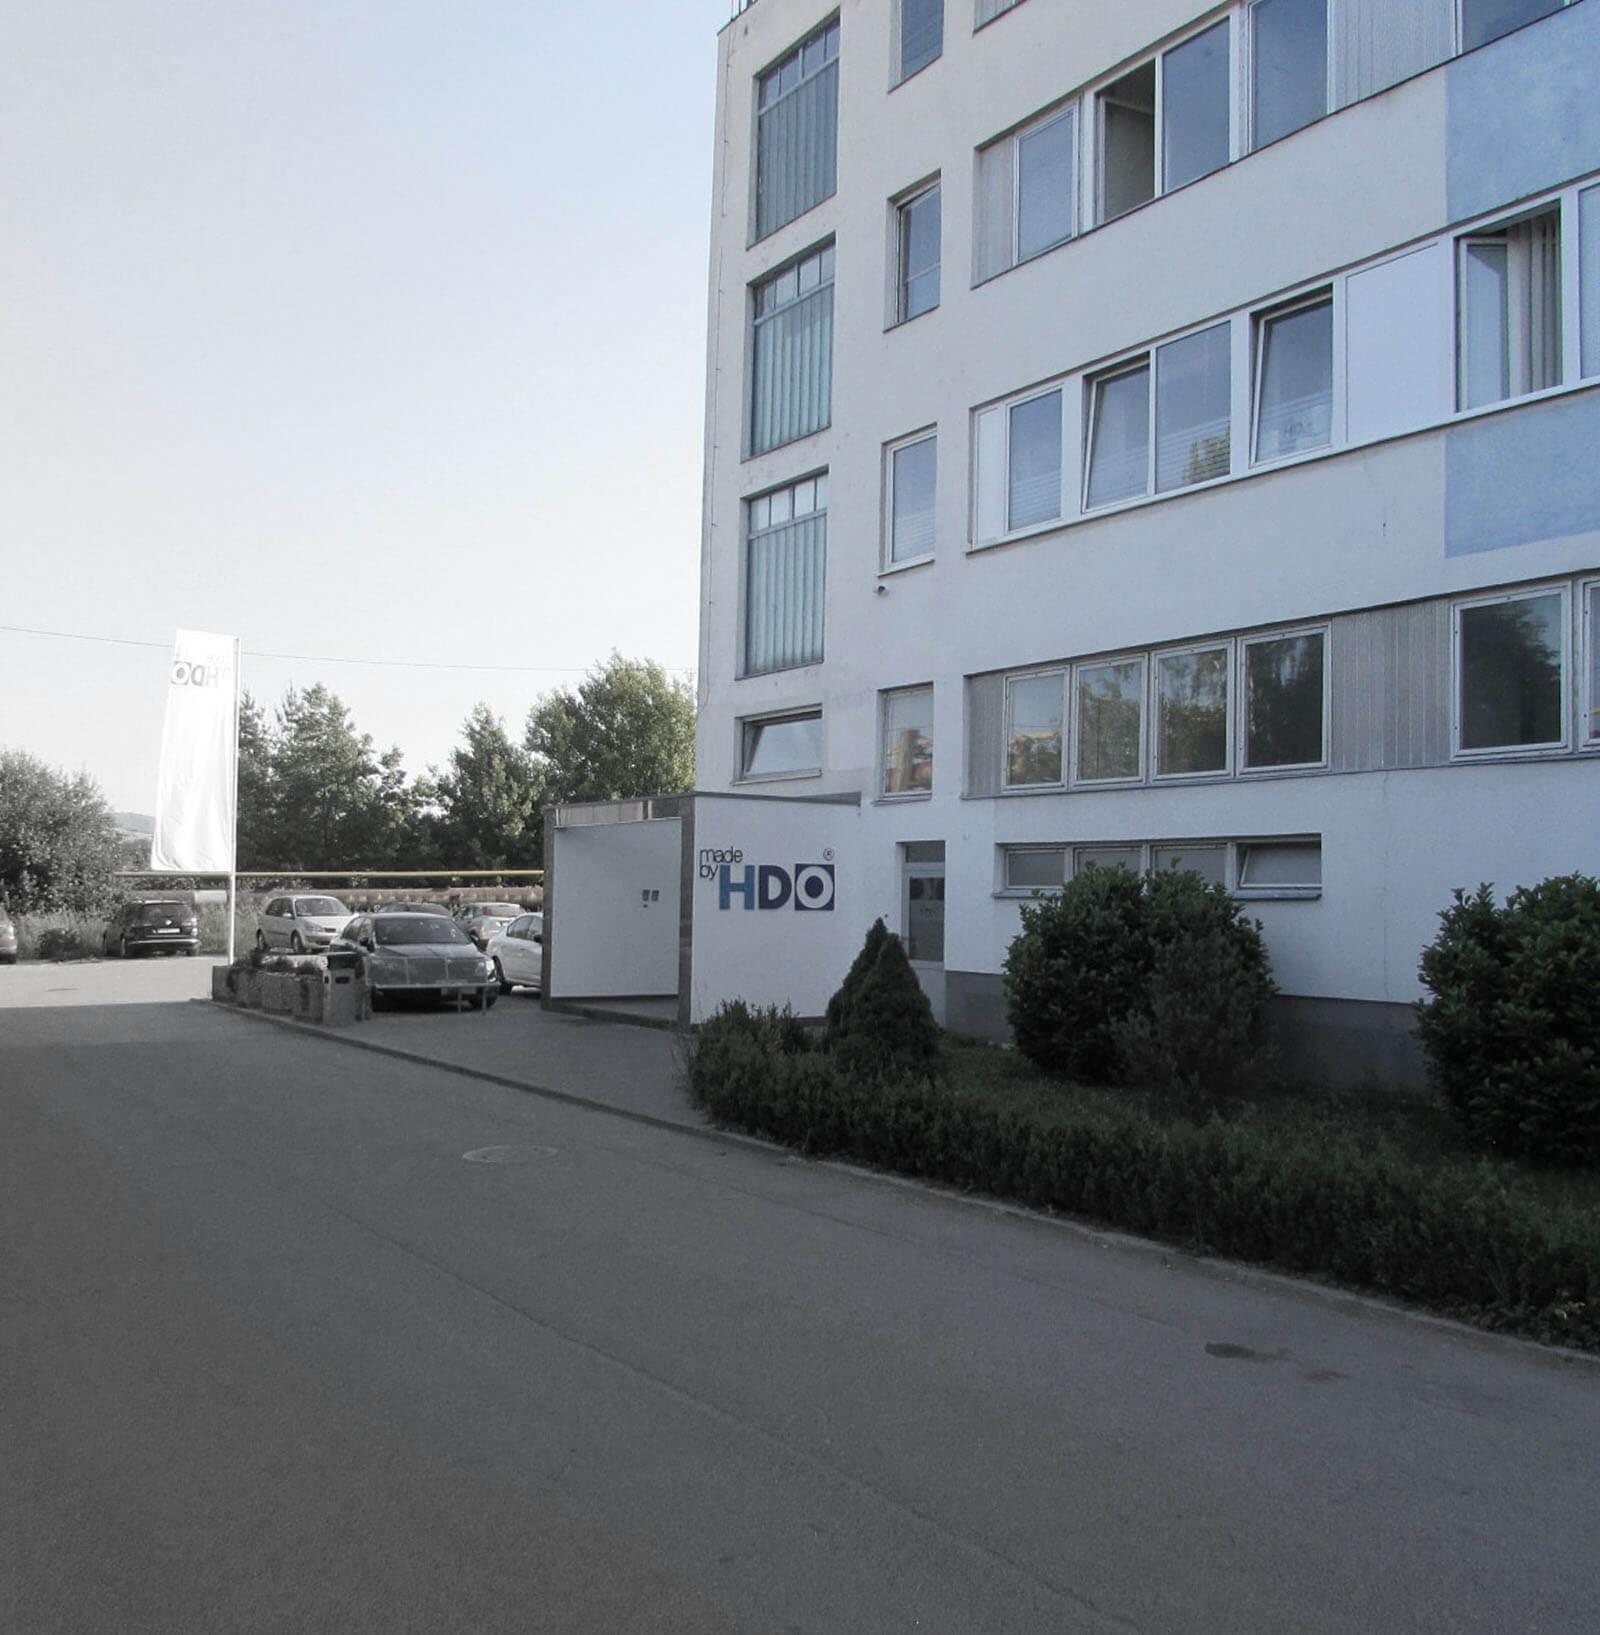 HDO Standort Myjava Slowakei